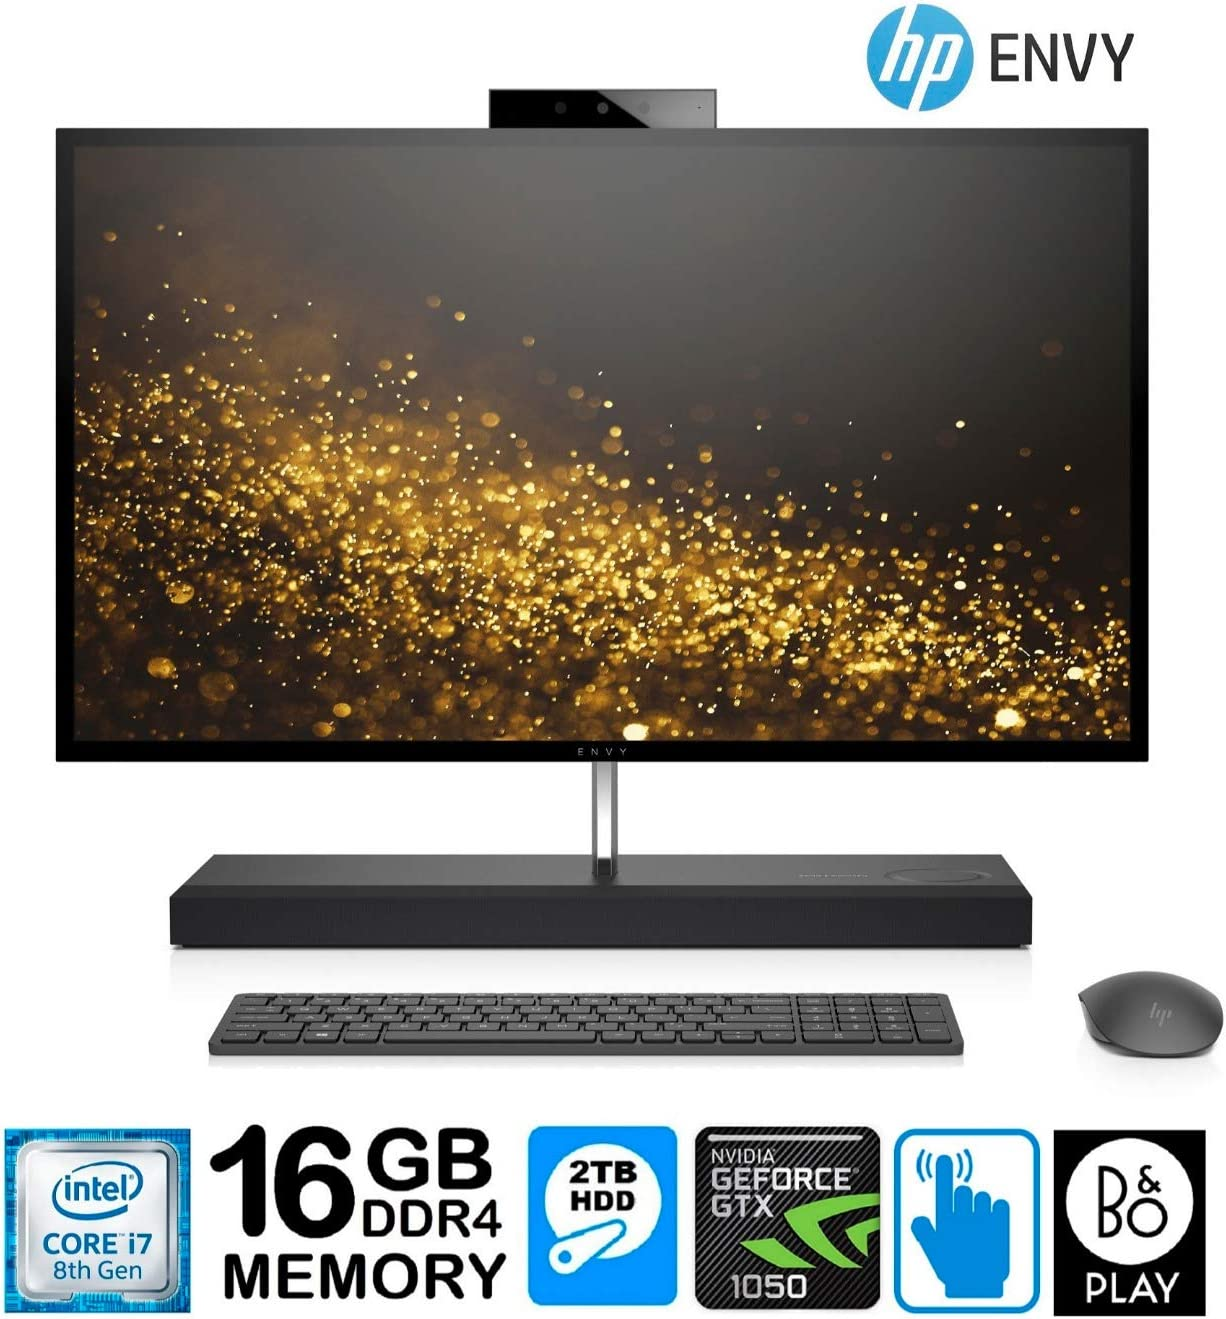 "HP Envy 27 All-in-One Core i7-8700T 16GB 2TB HD 27"" QHD Touchscreen GTX1050 4GB (Renewed)"